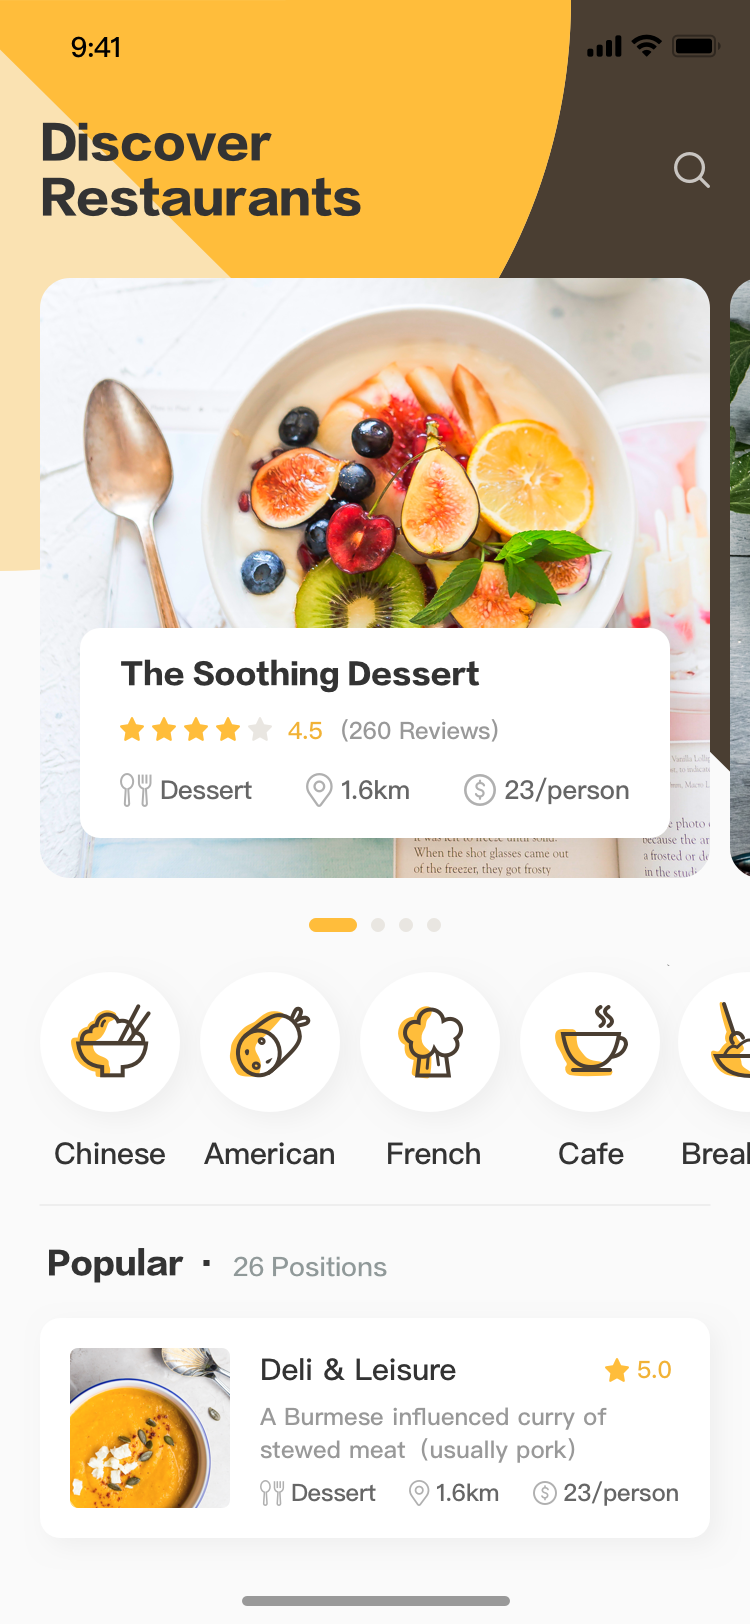 Discover restaurants1 1x